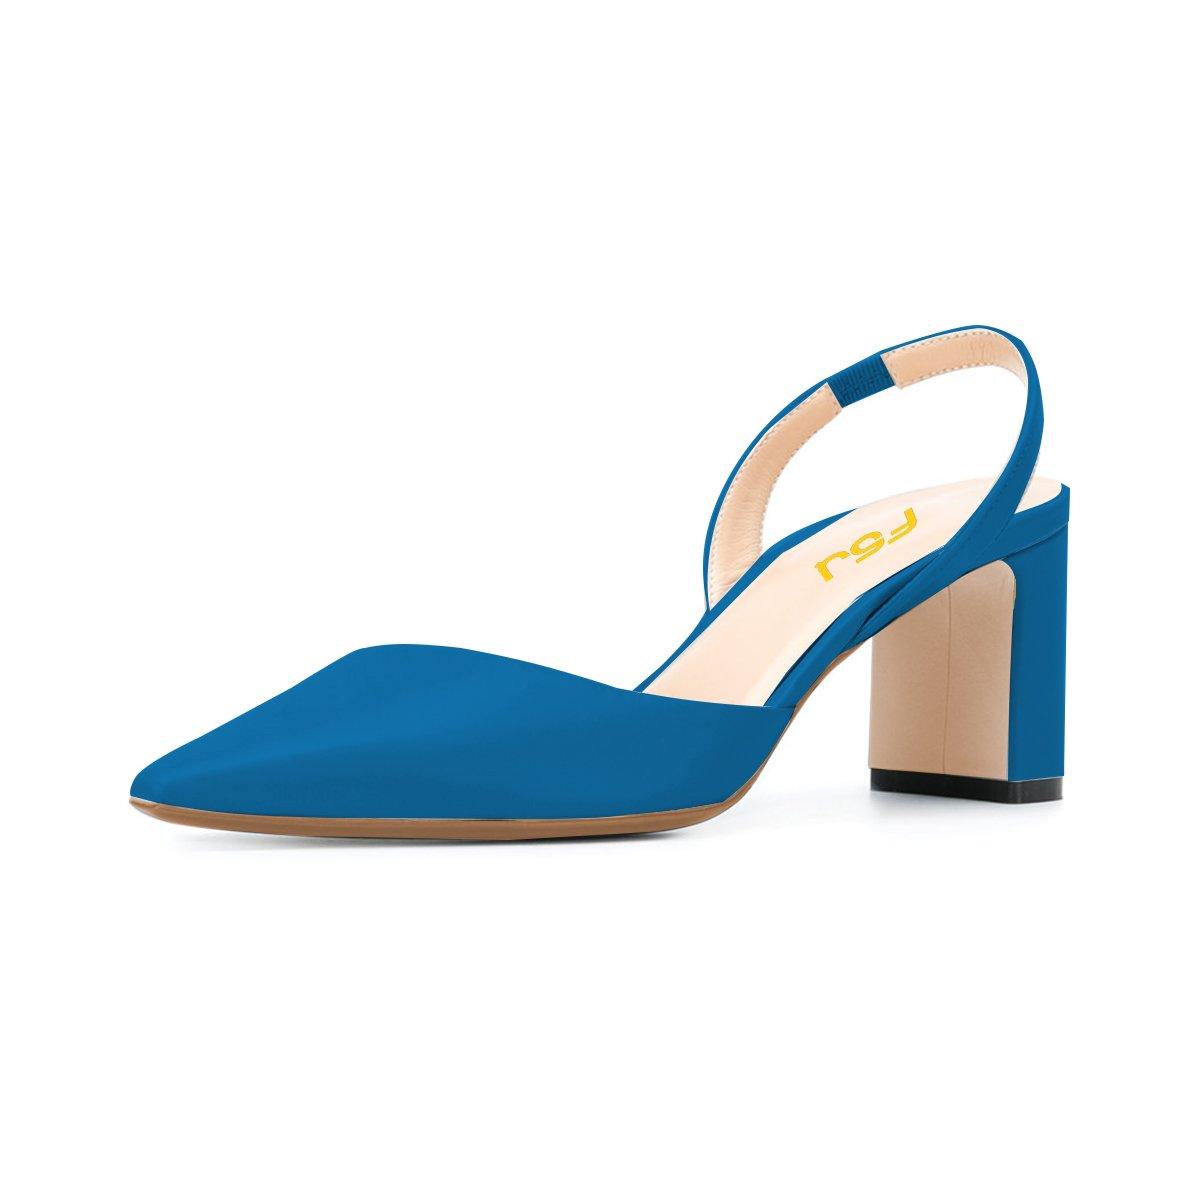 FSJ Women Classic Pointy Toe Pumps Chunky Mid Heels Slingback Sandals Comfortable Shoes Size 4-15 US B07BY1K1JC 7 B(M) US|Blue